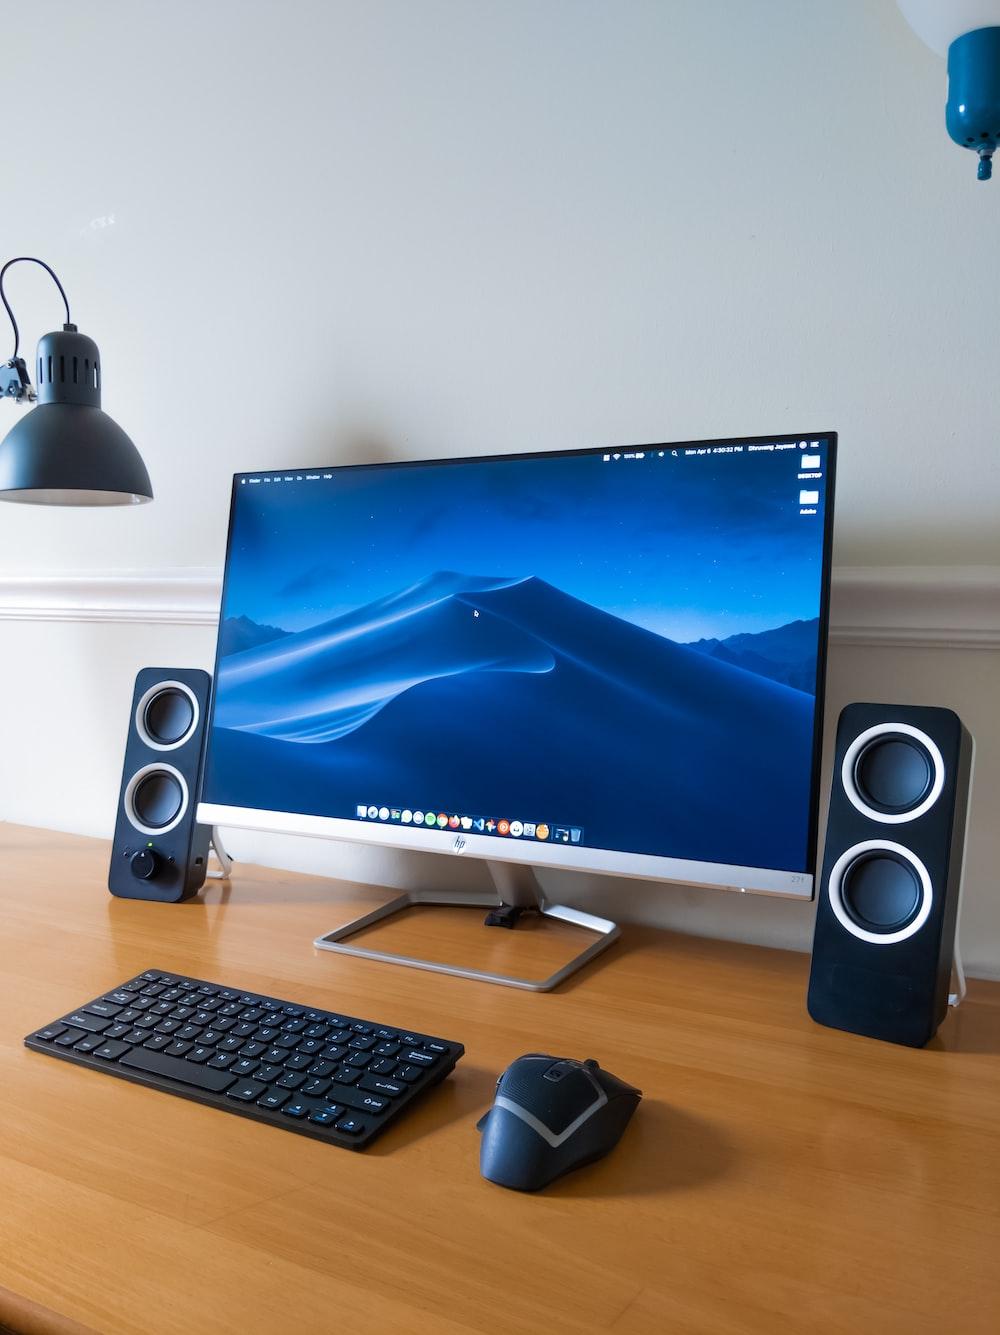 black computer keyboard beside black flat screen computer monitor